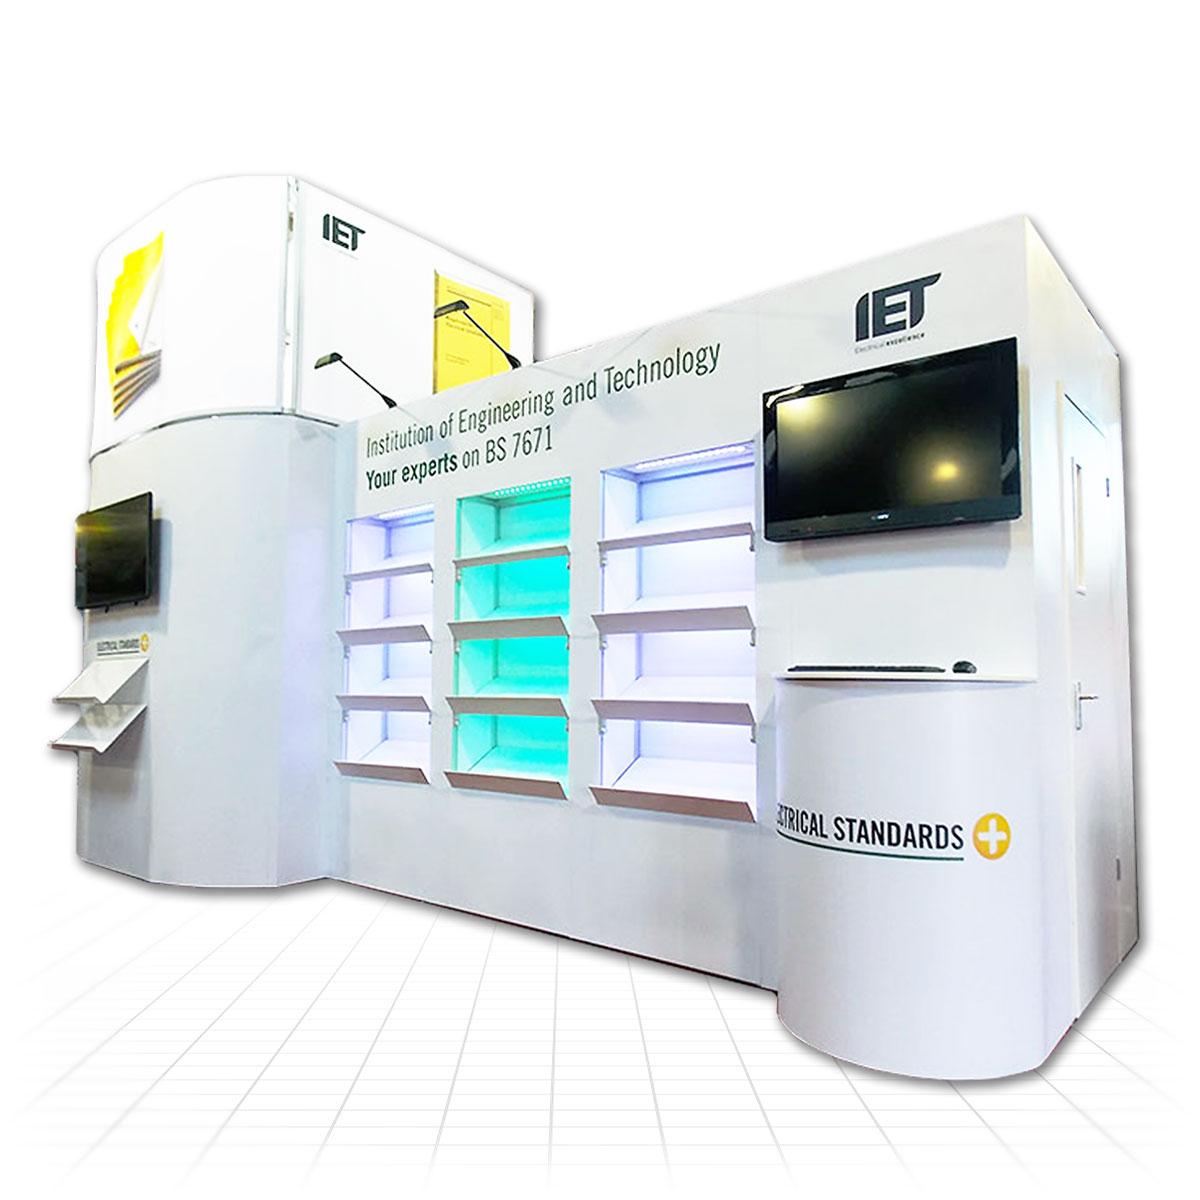 Zeus Exhibition Stand : Modular exhibition stands advanced build